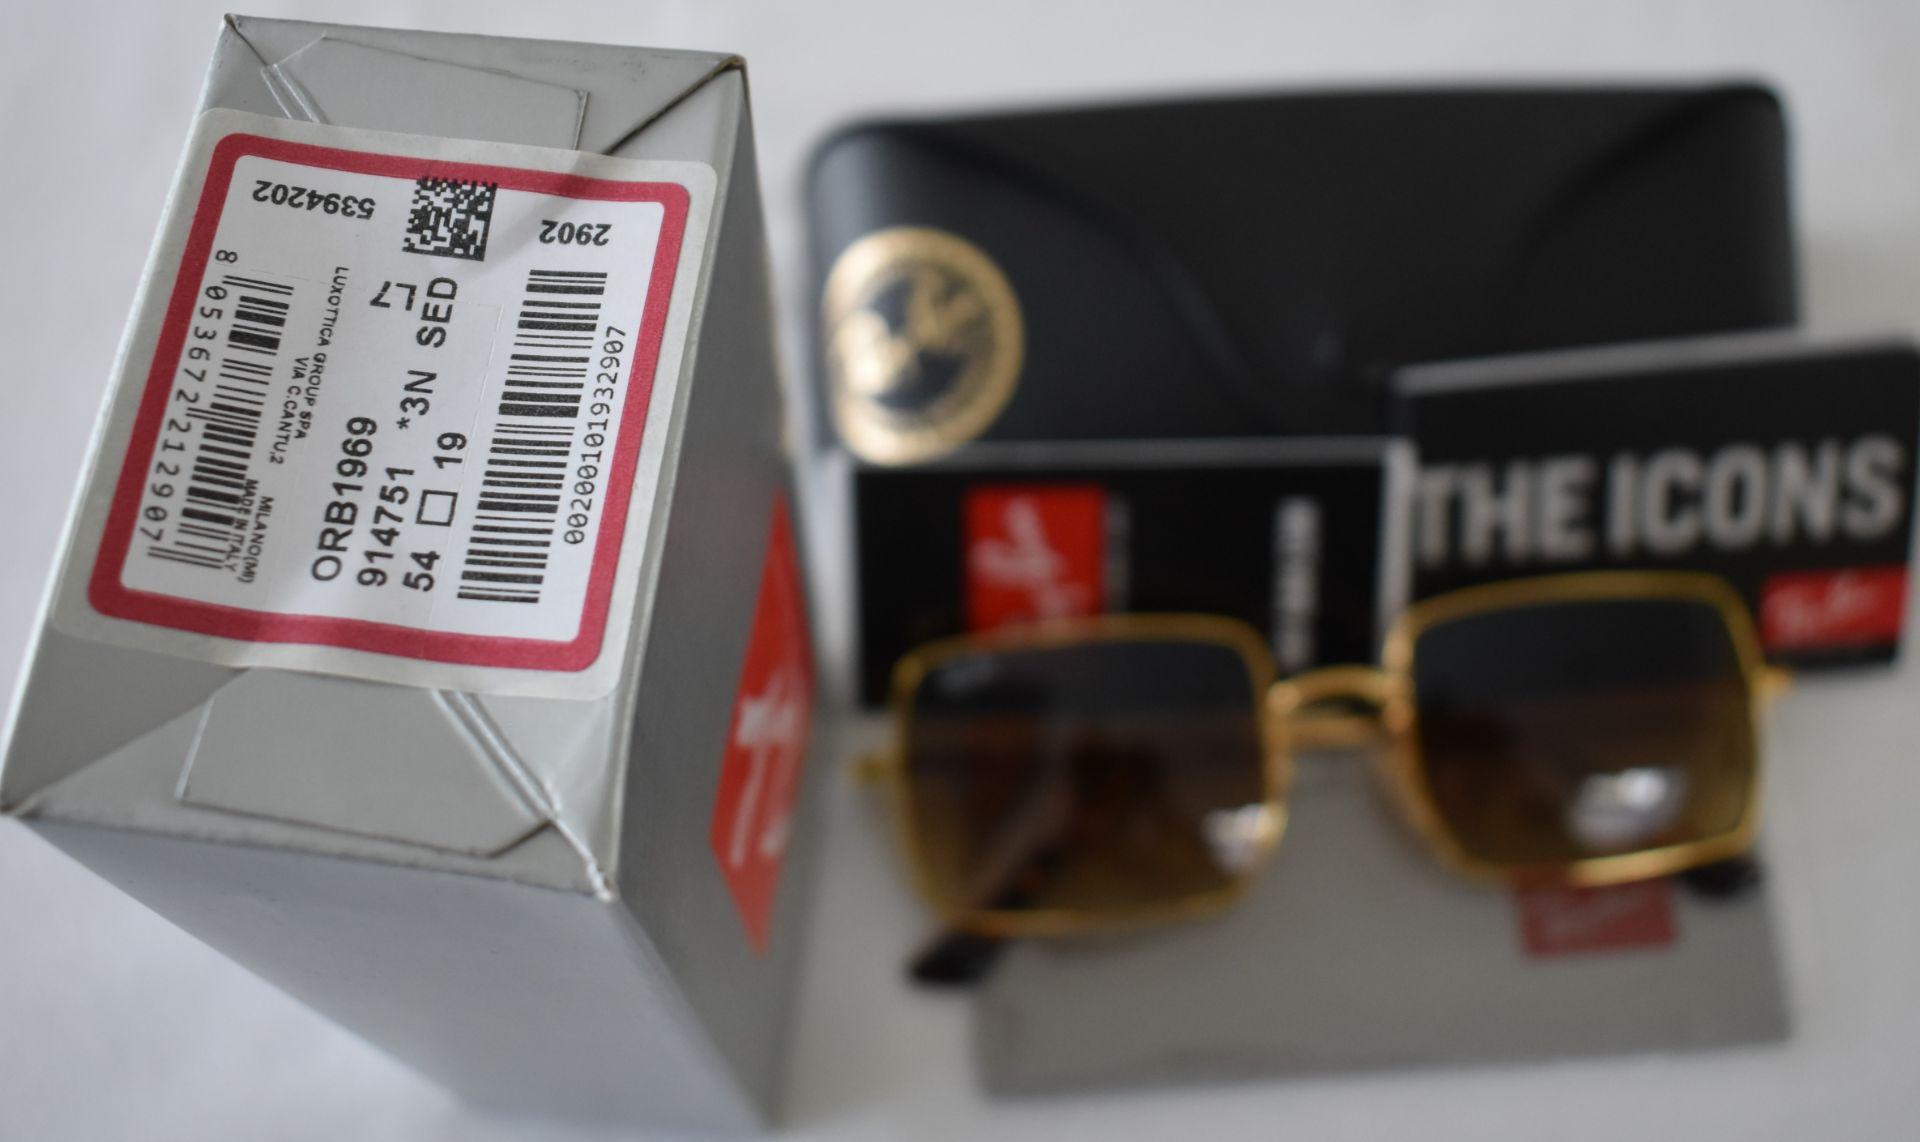 Ray Ban Sunglasses ORB1969 914751 *3N - Image 3 of 3